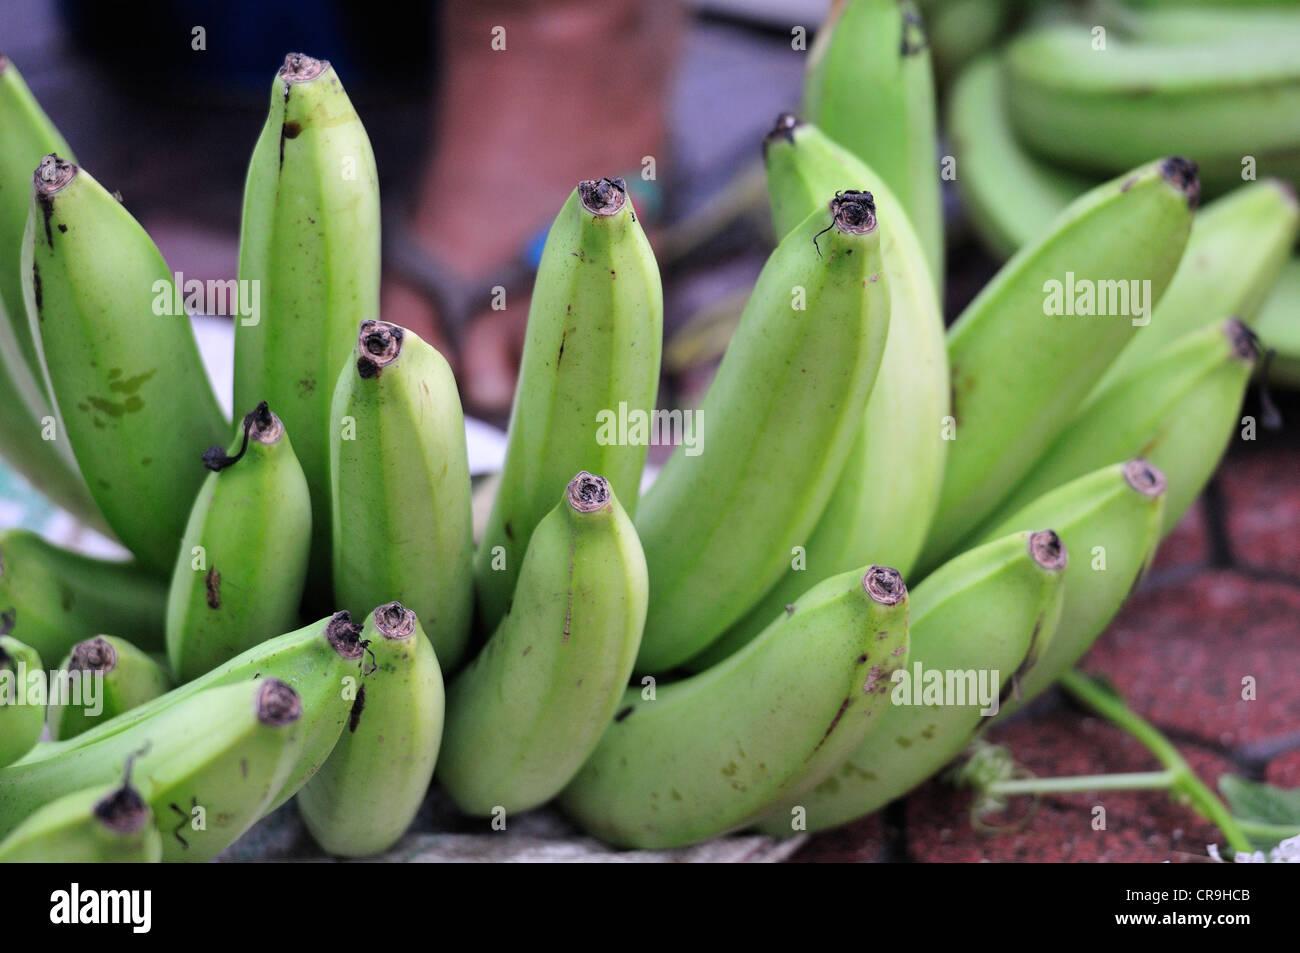 Fruits of banana (Musa balbisiana), Tegallalang market, Ubud, Bali, Indonesia, Asia - Stock Image